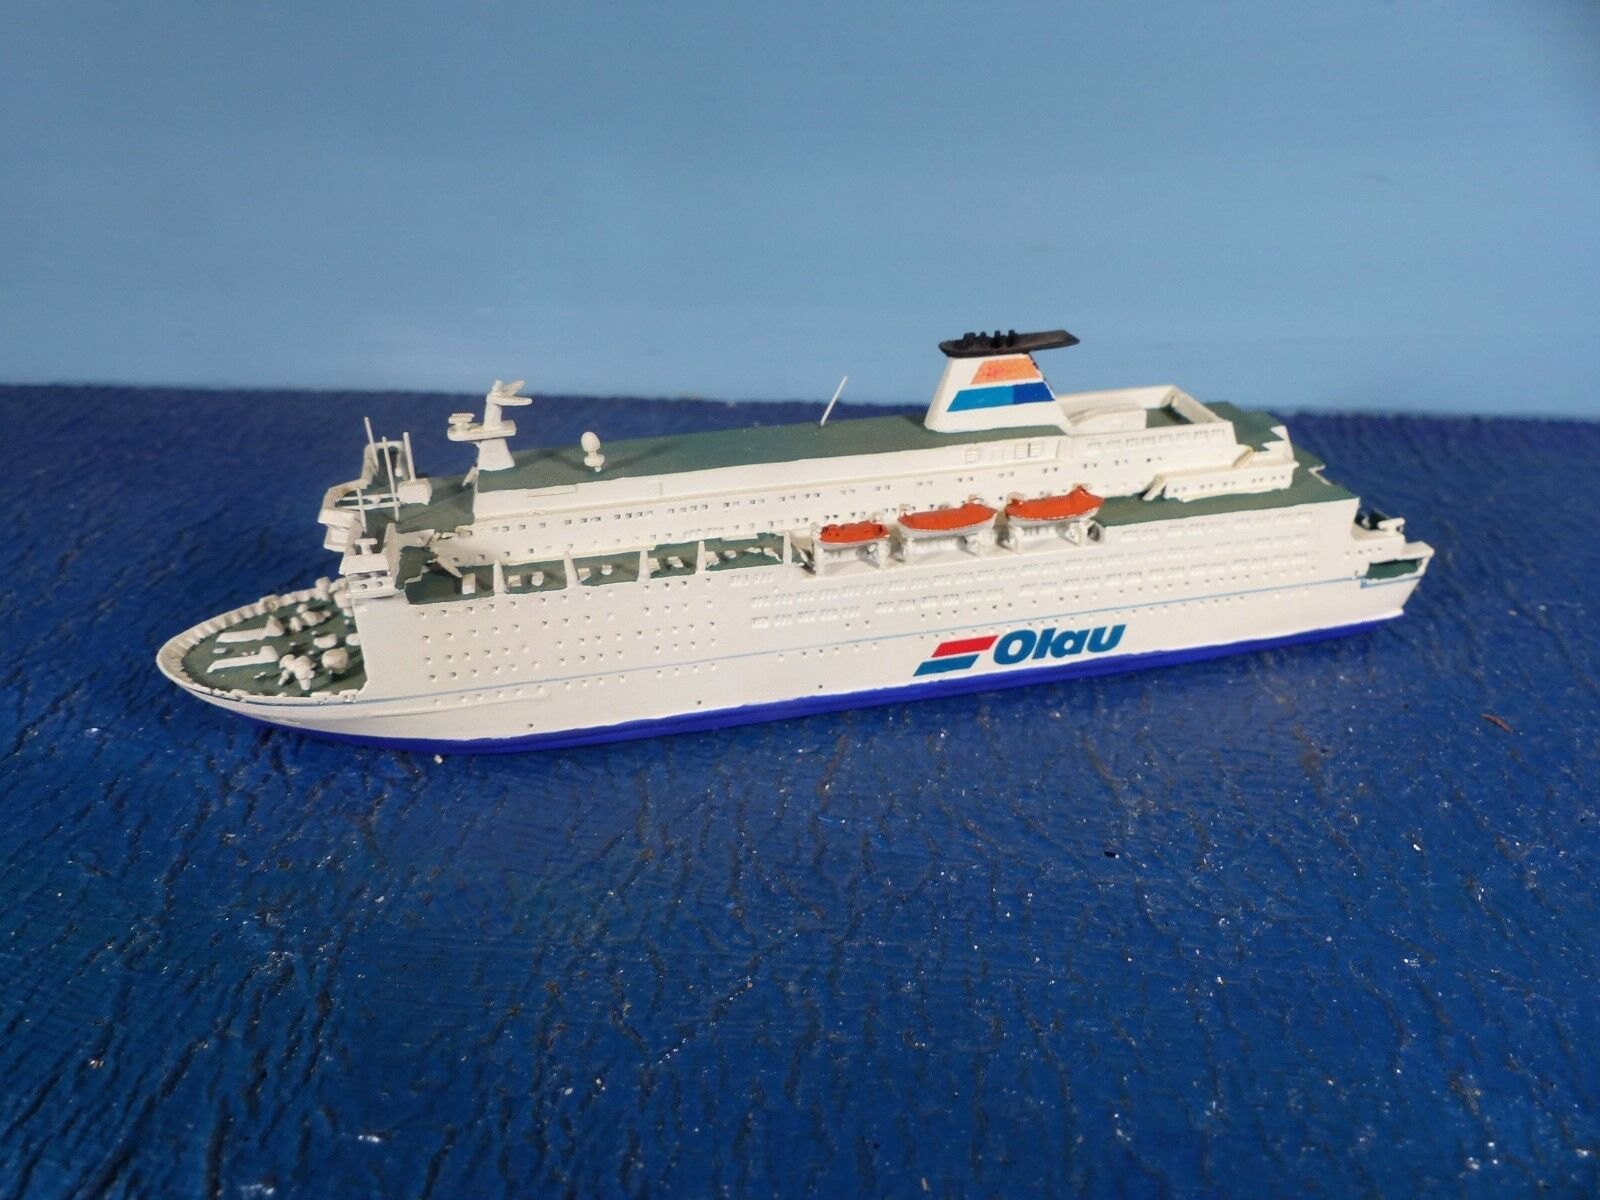 Bille barco 1 1250 D. ferry entra  OLAU Hollandia  bi 83